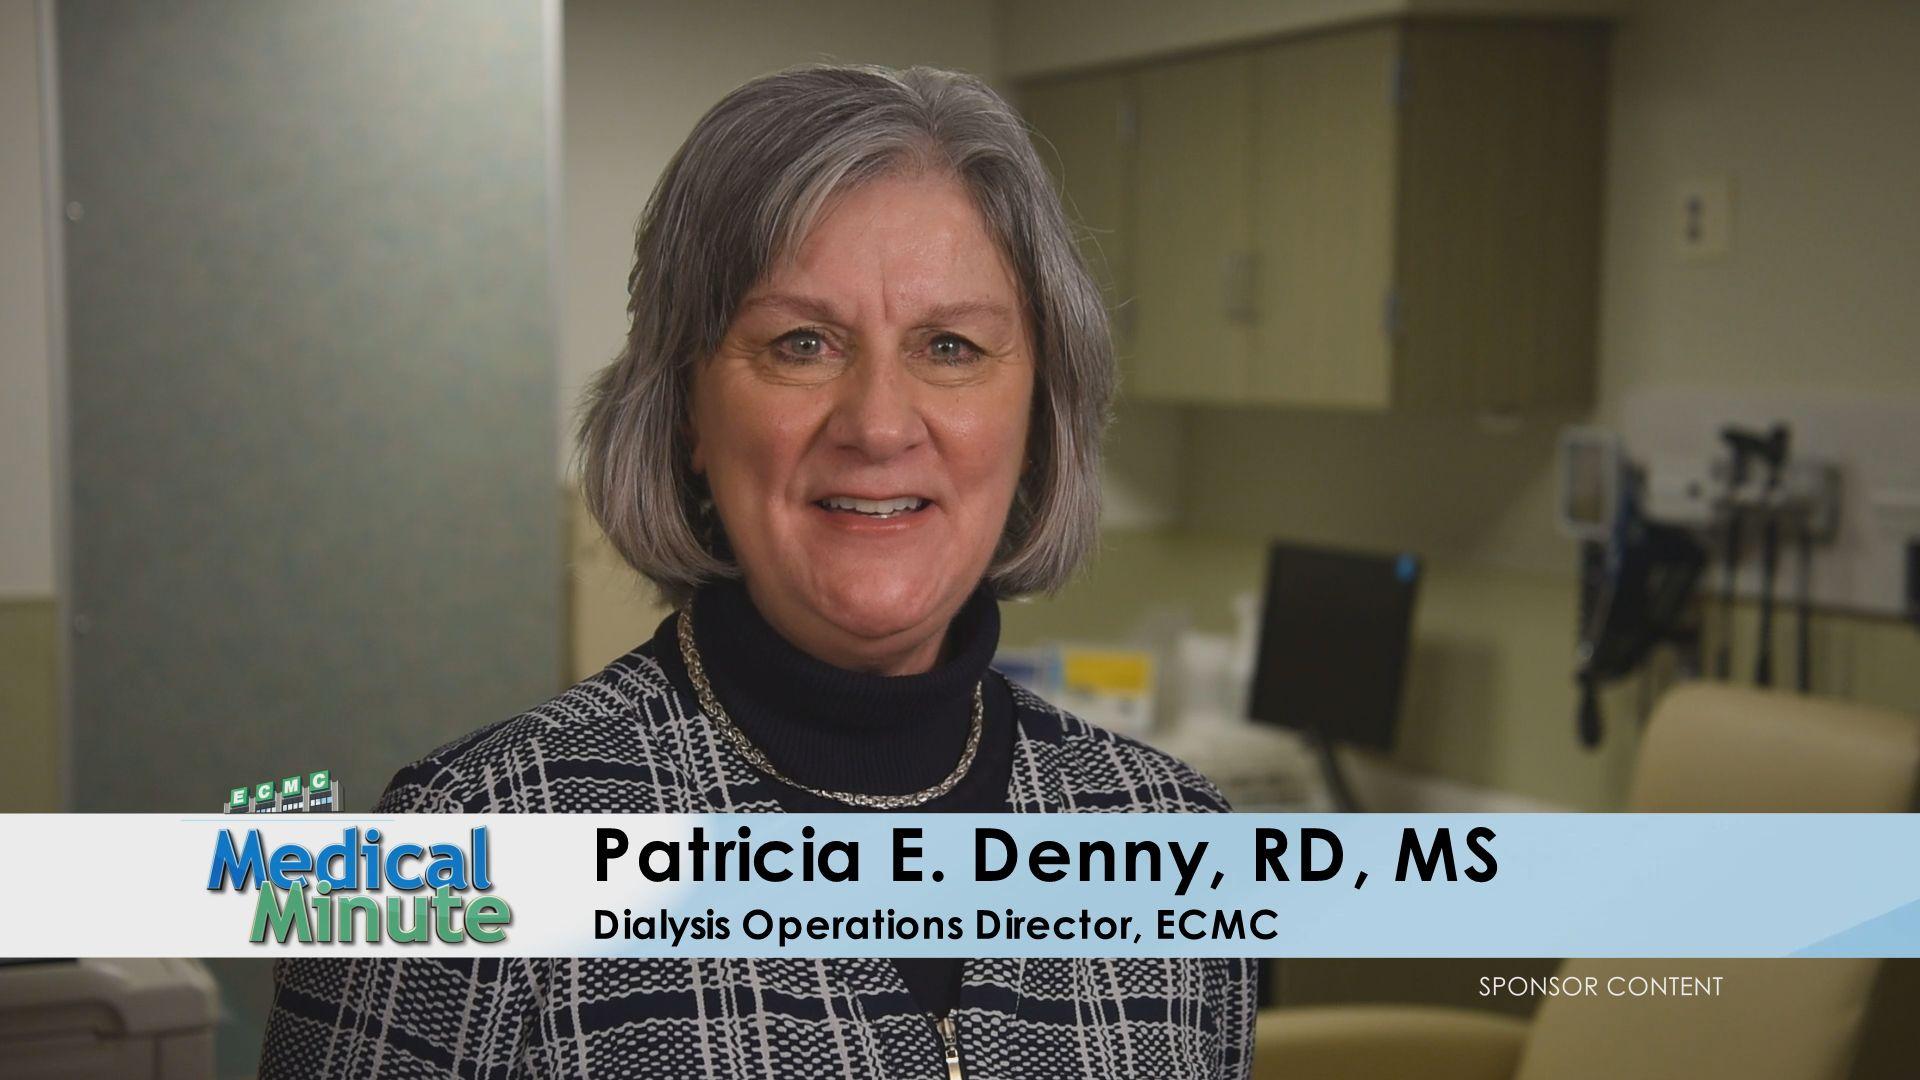 ECMCMedicalMinute PatriciaDenny,RD,MS KidneyDiseasePatientEducationSessions 093019 STILL